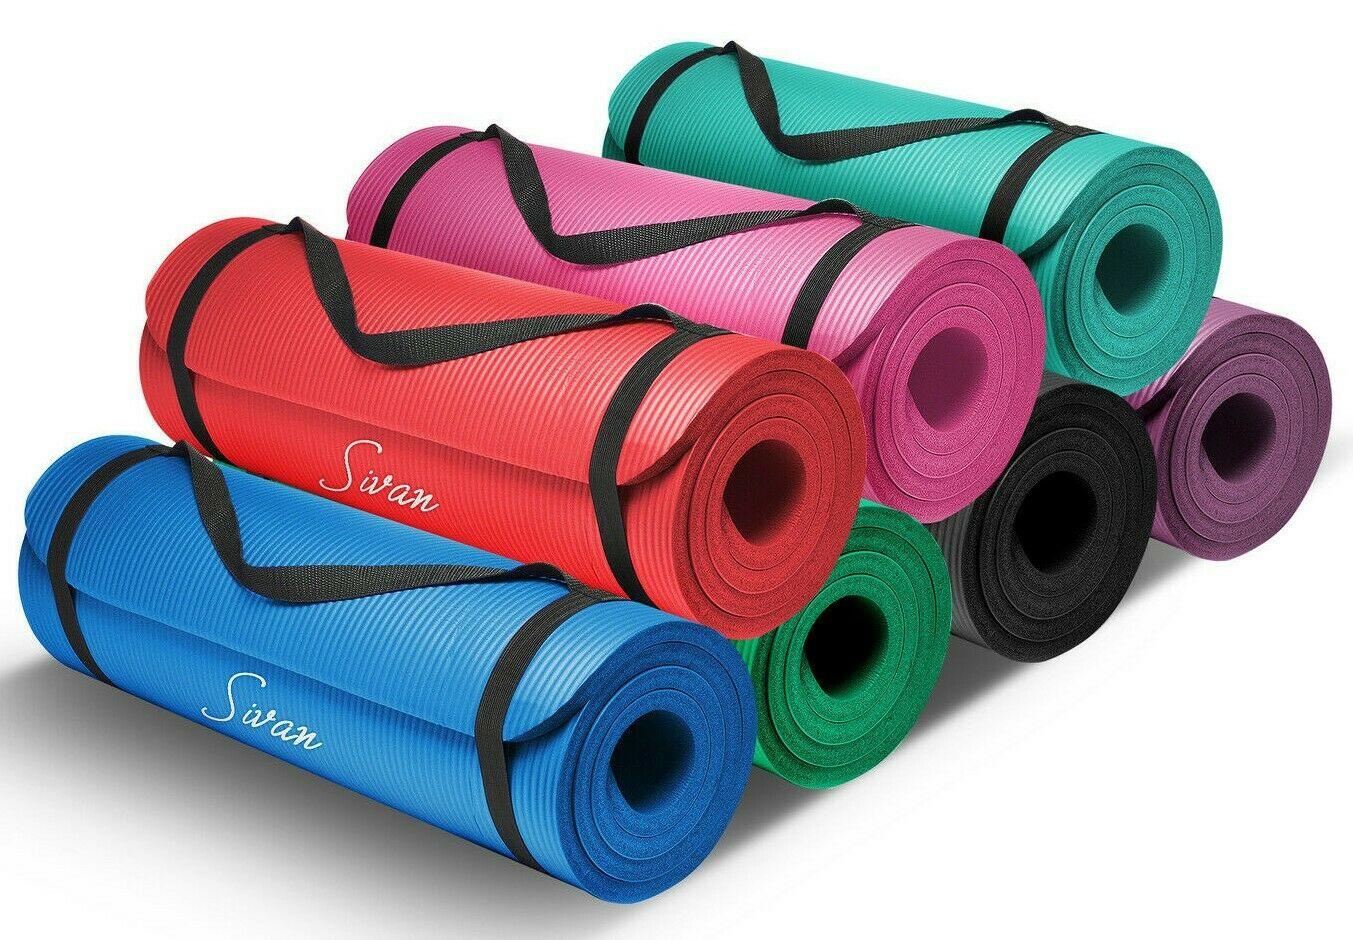 "Sivan Health & Fitness Yoga Mat - 1/2"" Thick, 71"" Inch Long - NBR Comfort Foam 1"